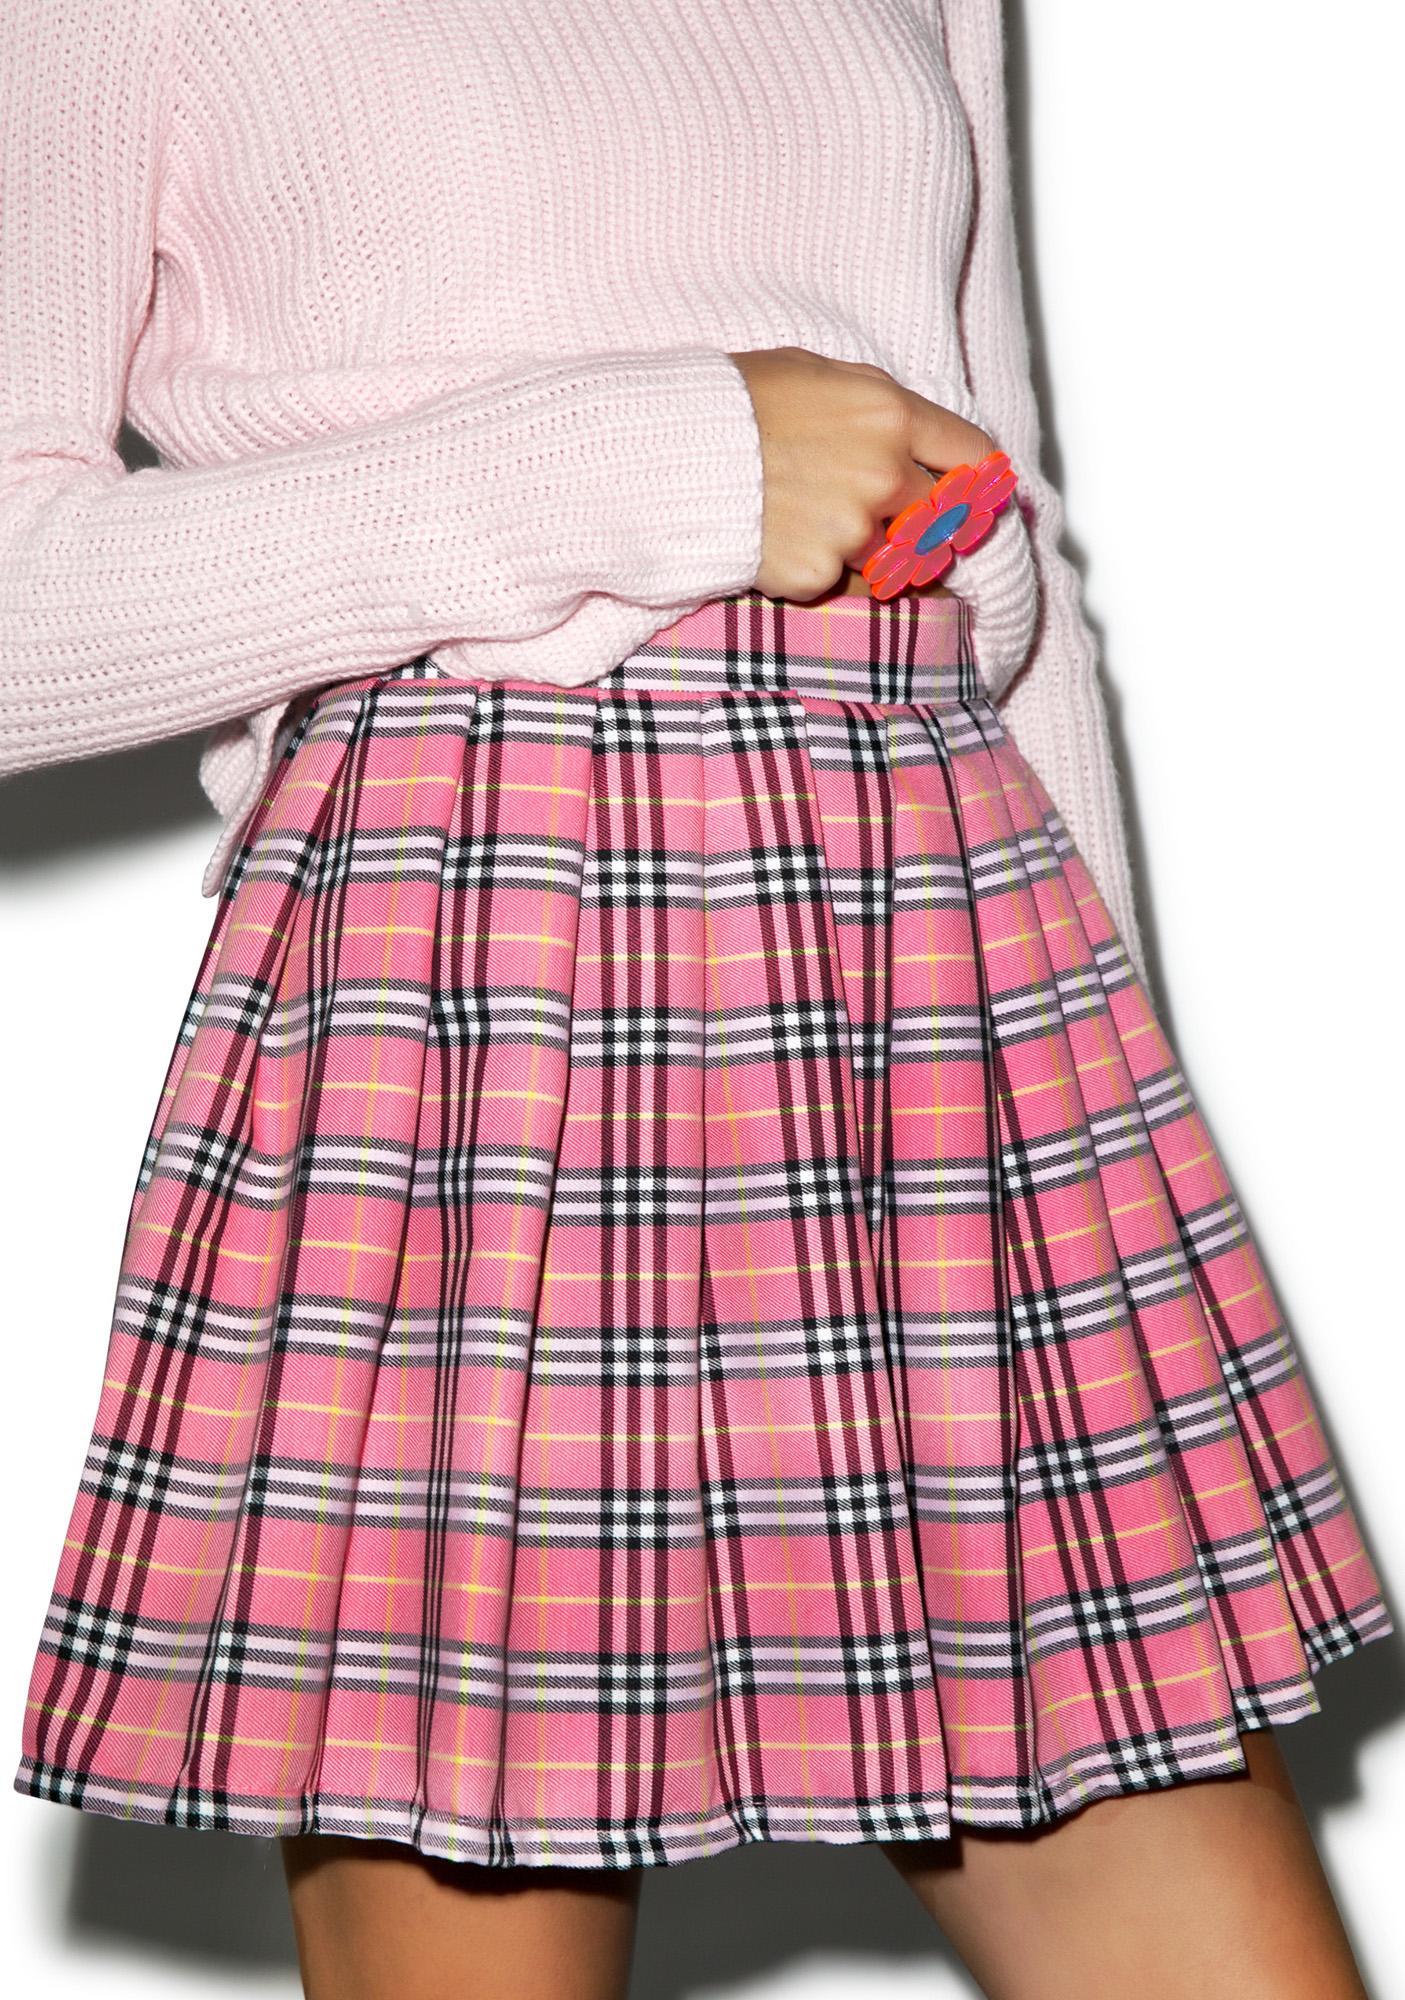 Reality Bites Baby Plaid Skirt